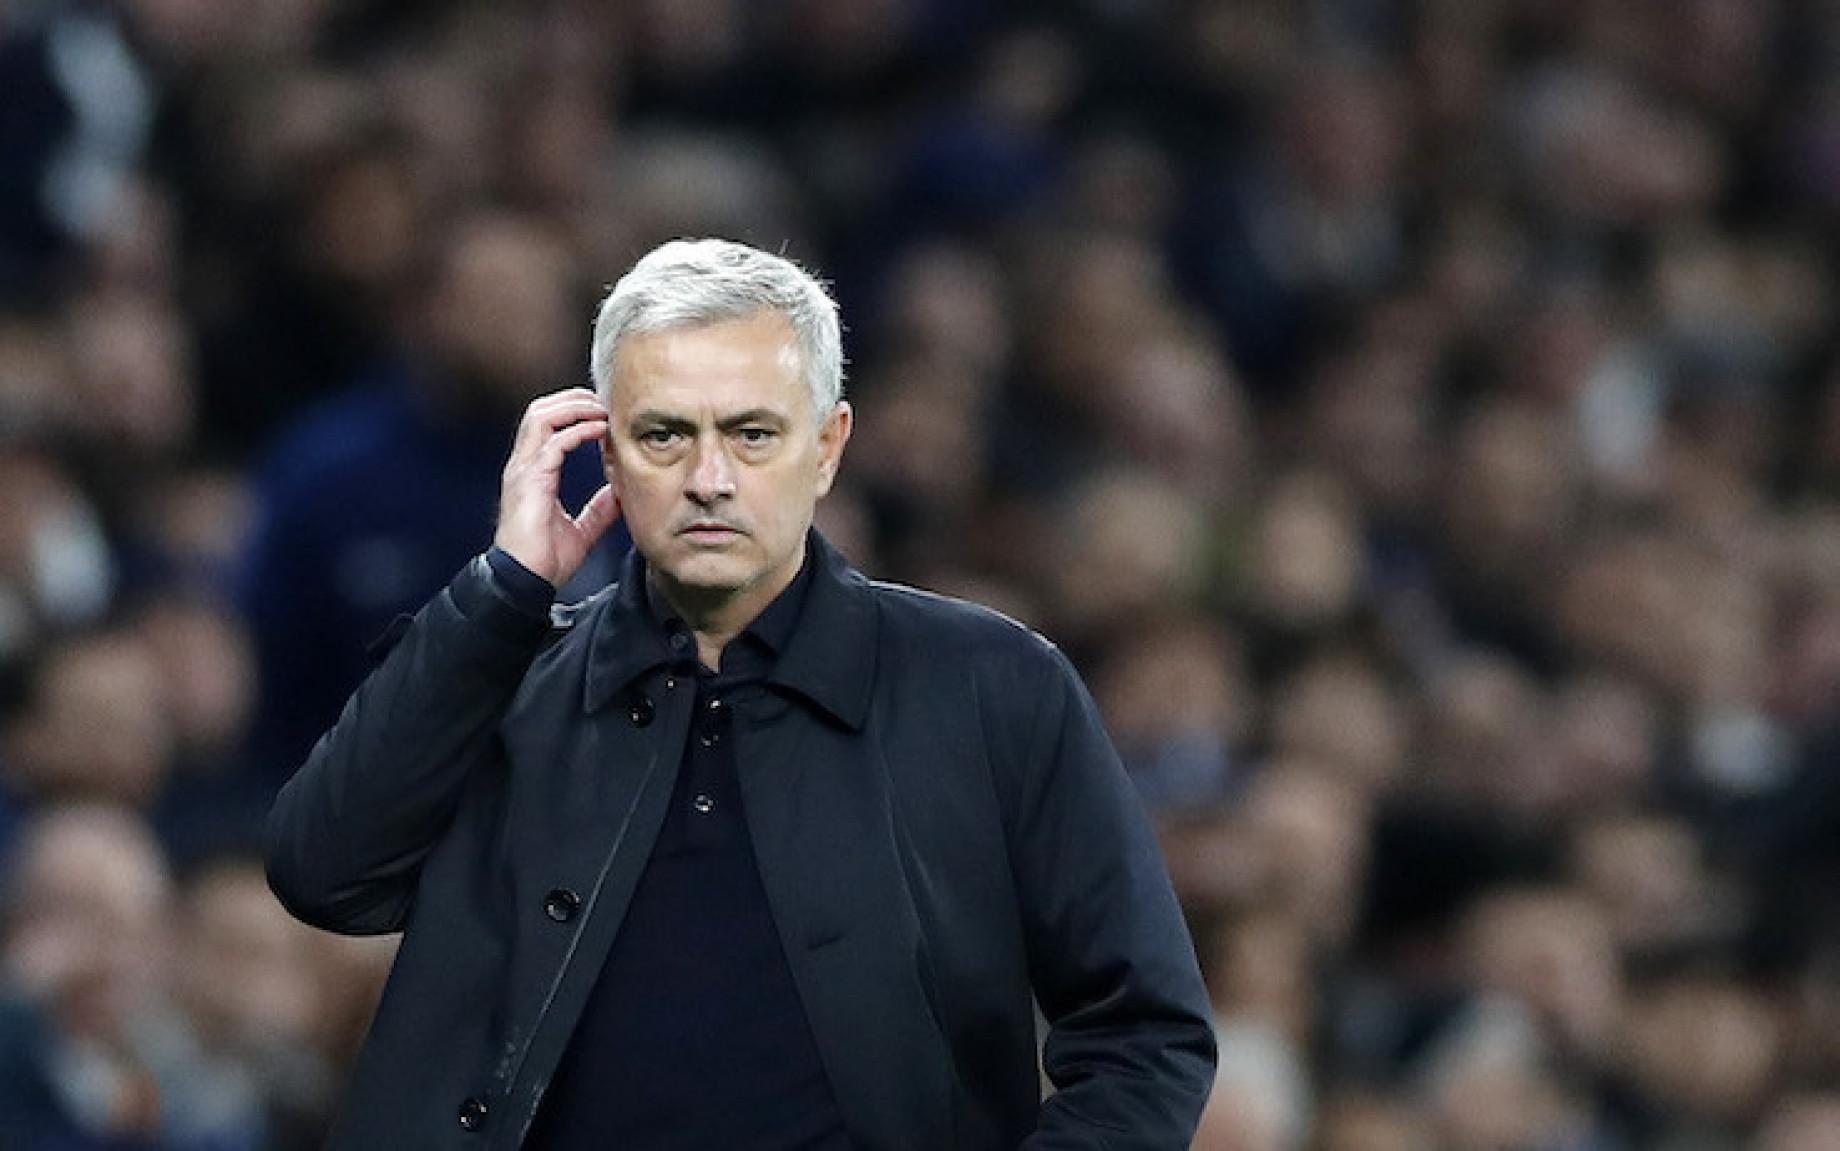 mourinho-image.jpg